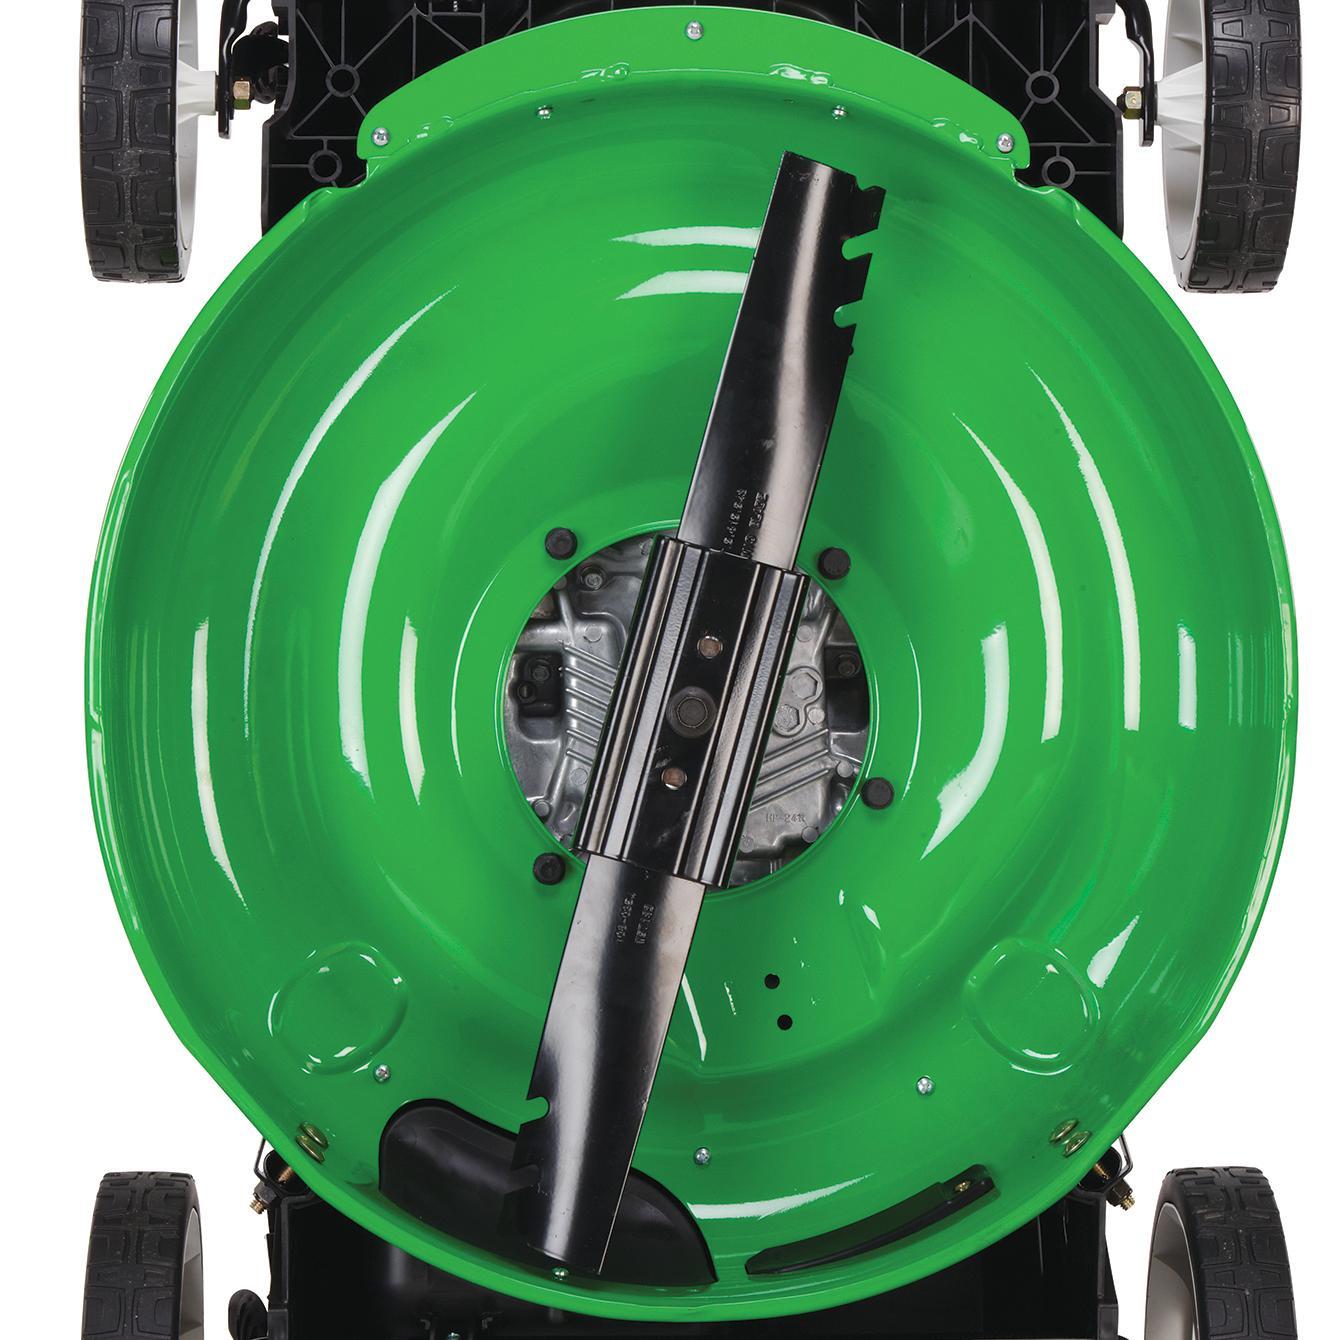 Amazon.com : Lawn-Boy 17730 21-Inch 6.5 Gross Torque Kohler XTX OHV, 3-in-1 Discharge High Wheel ...